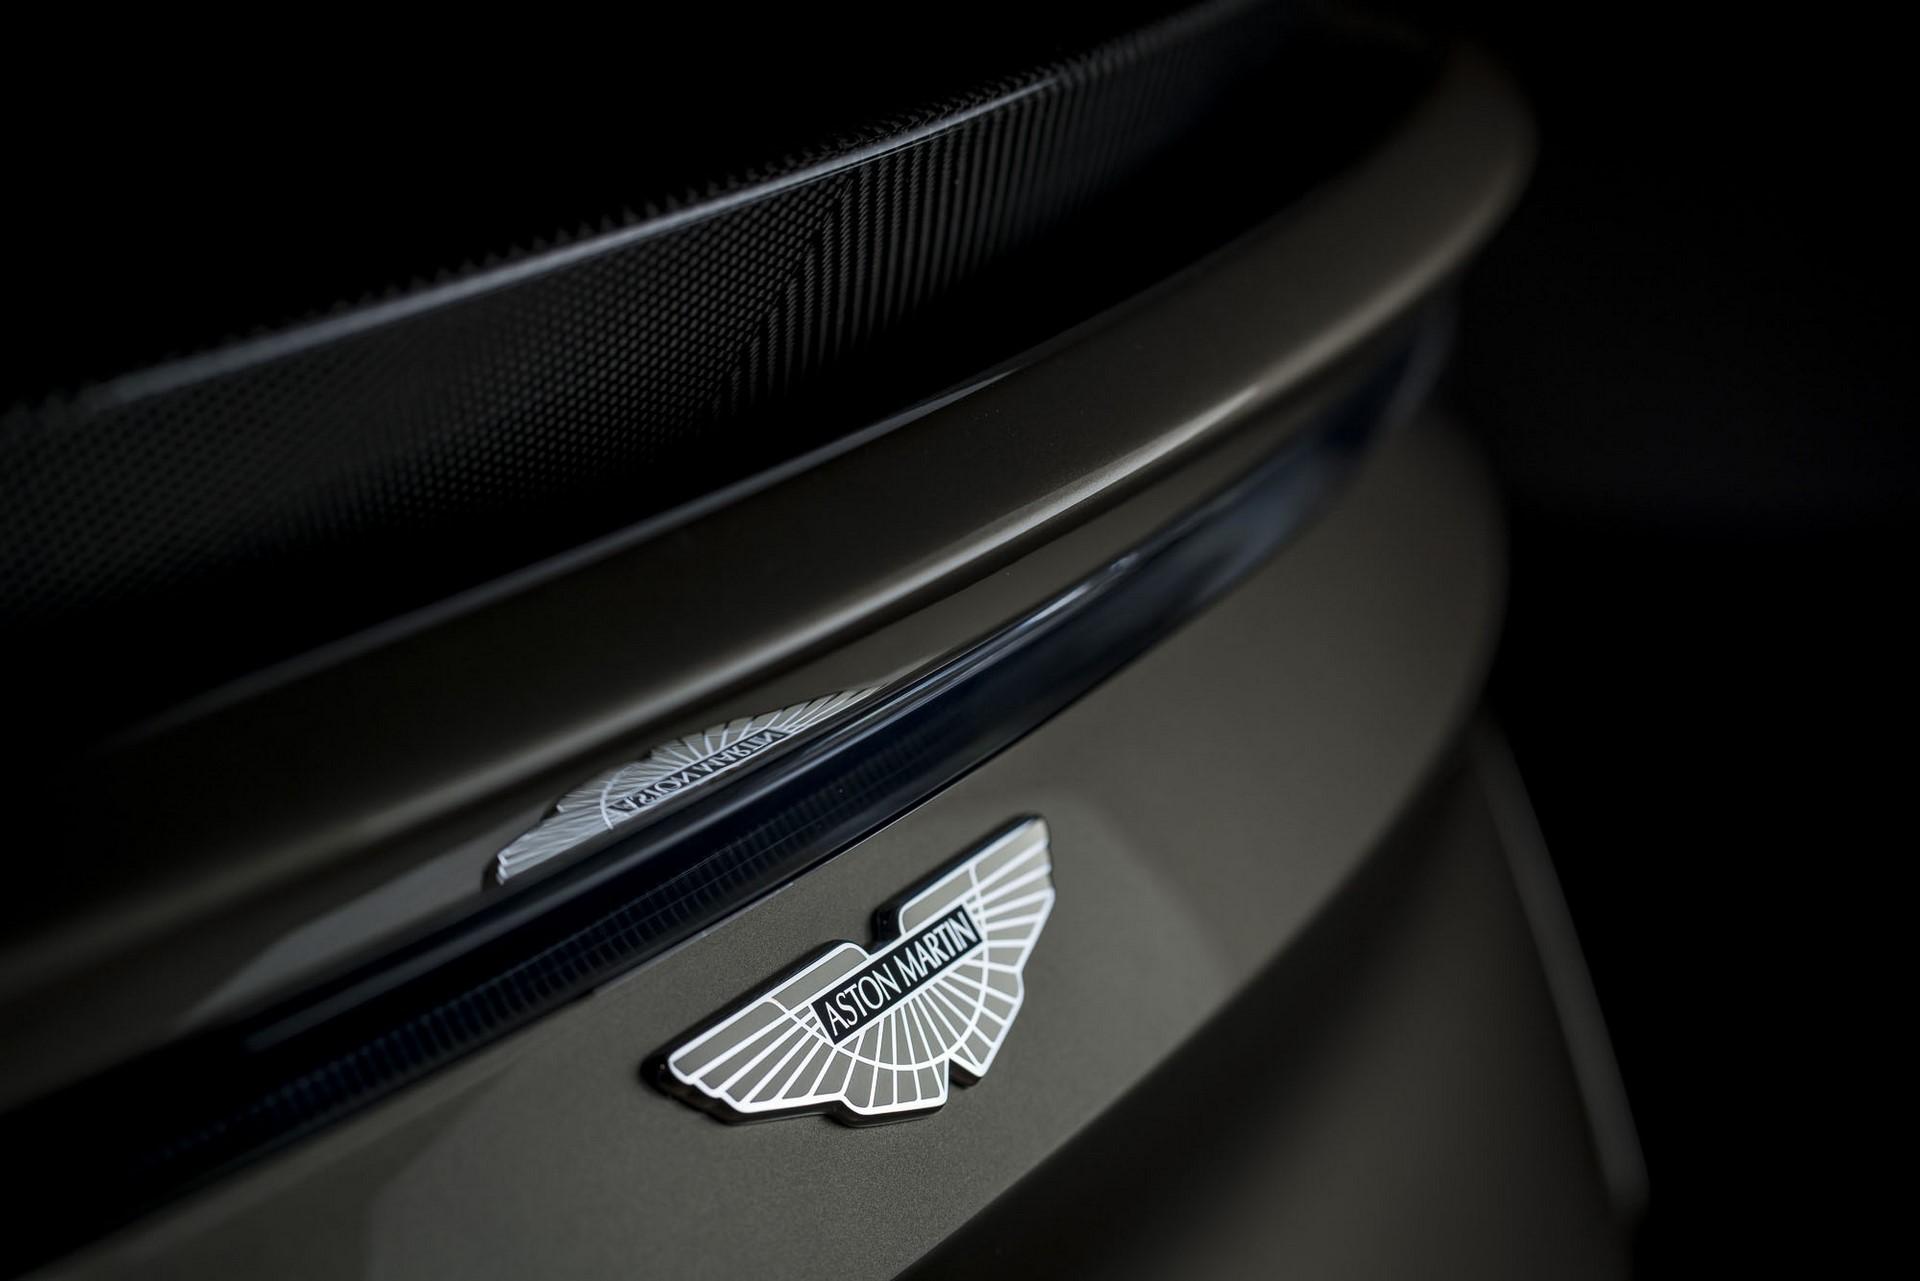 Aston-Martin-DBS-Superleggera-James-Bond-Special-Edition-12